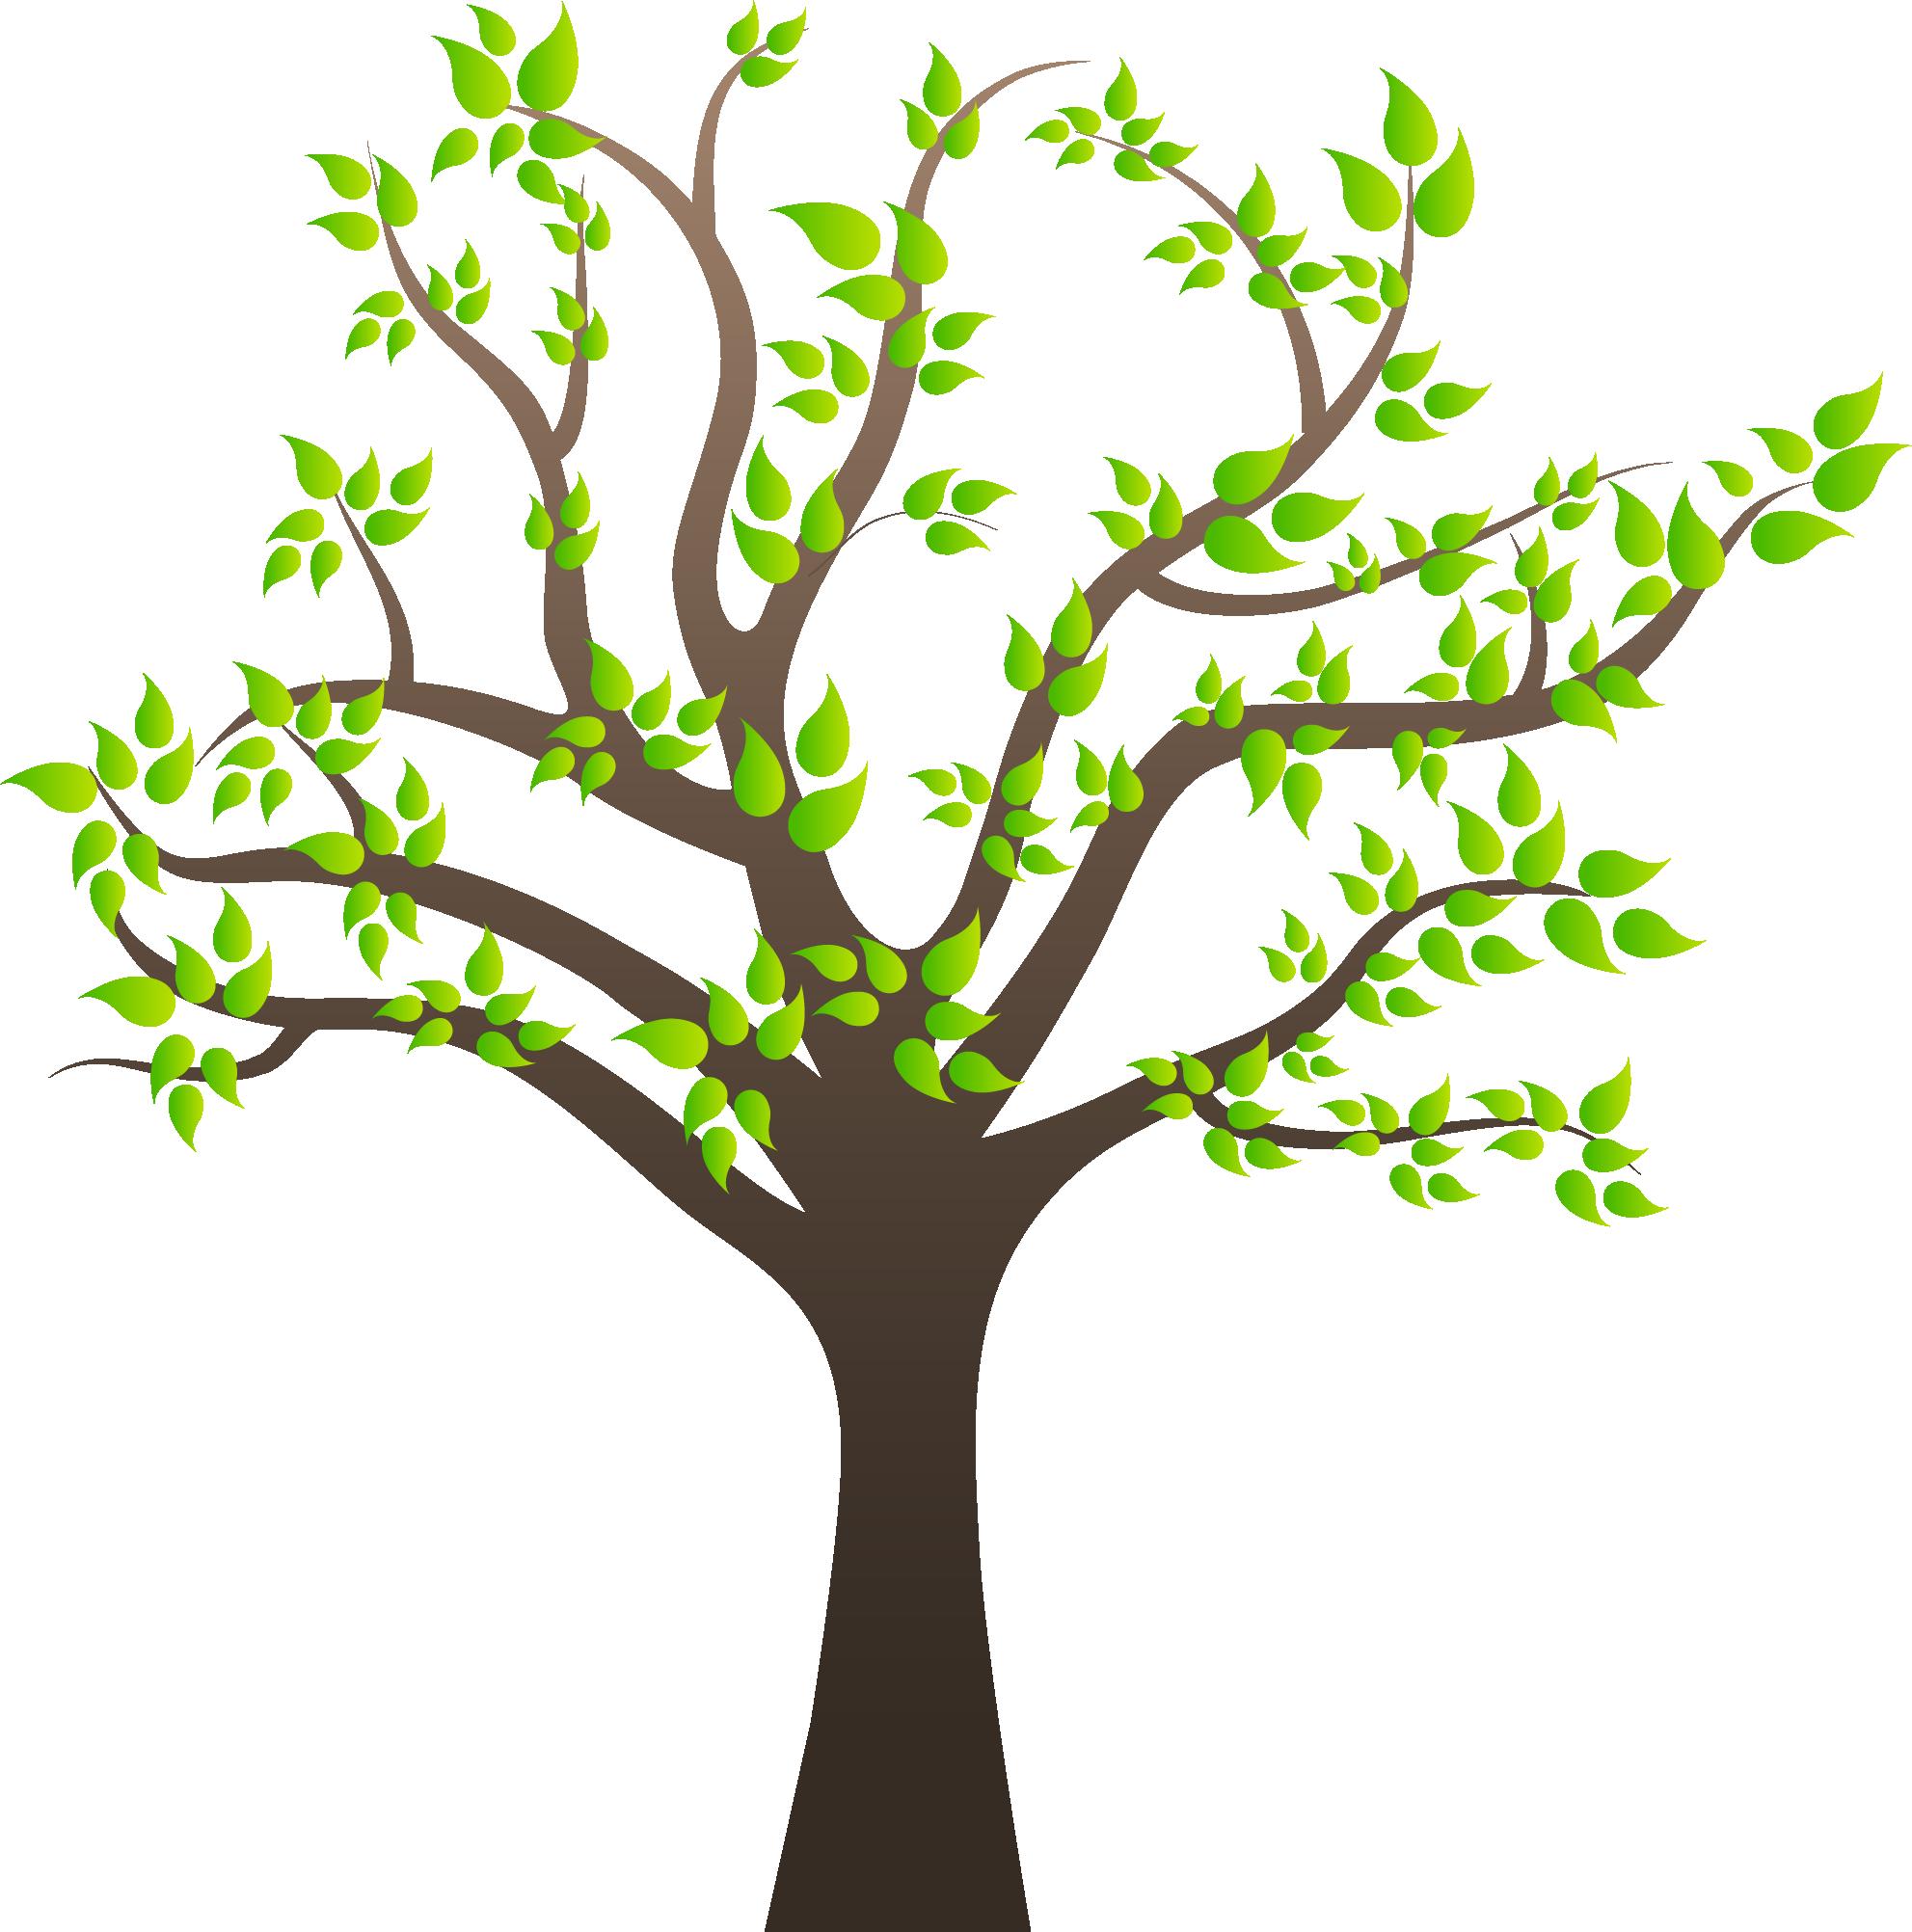 Stick clipart single tree, Stick single tree Transparent.